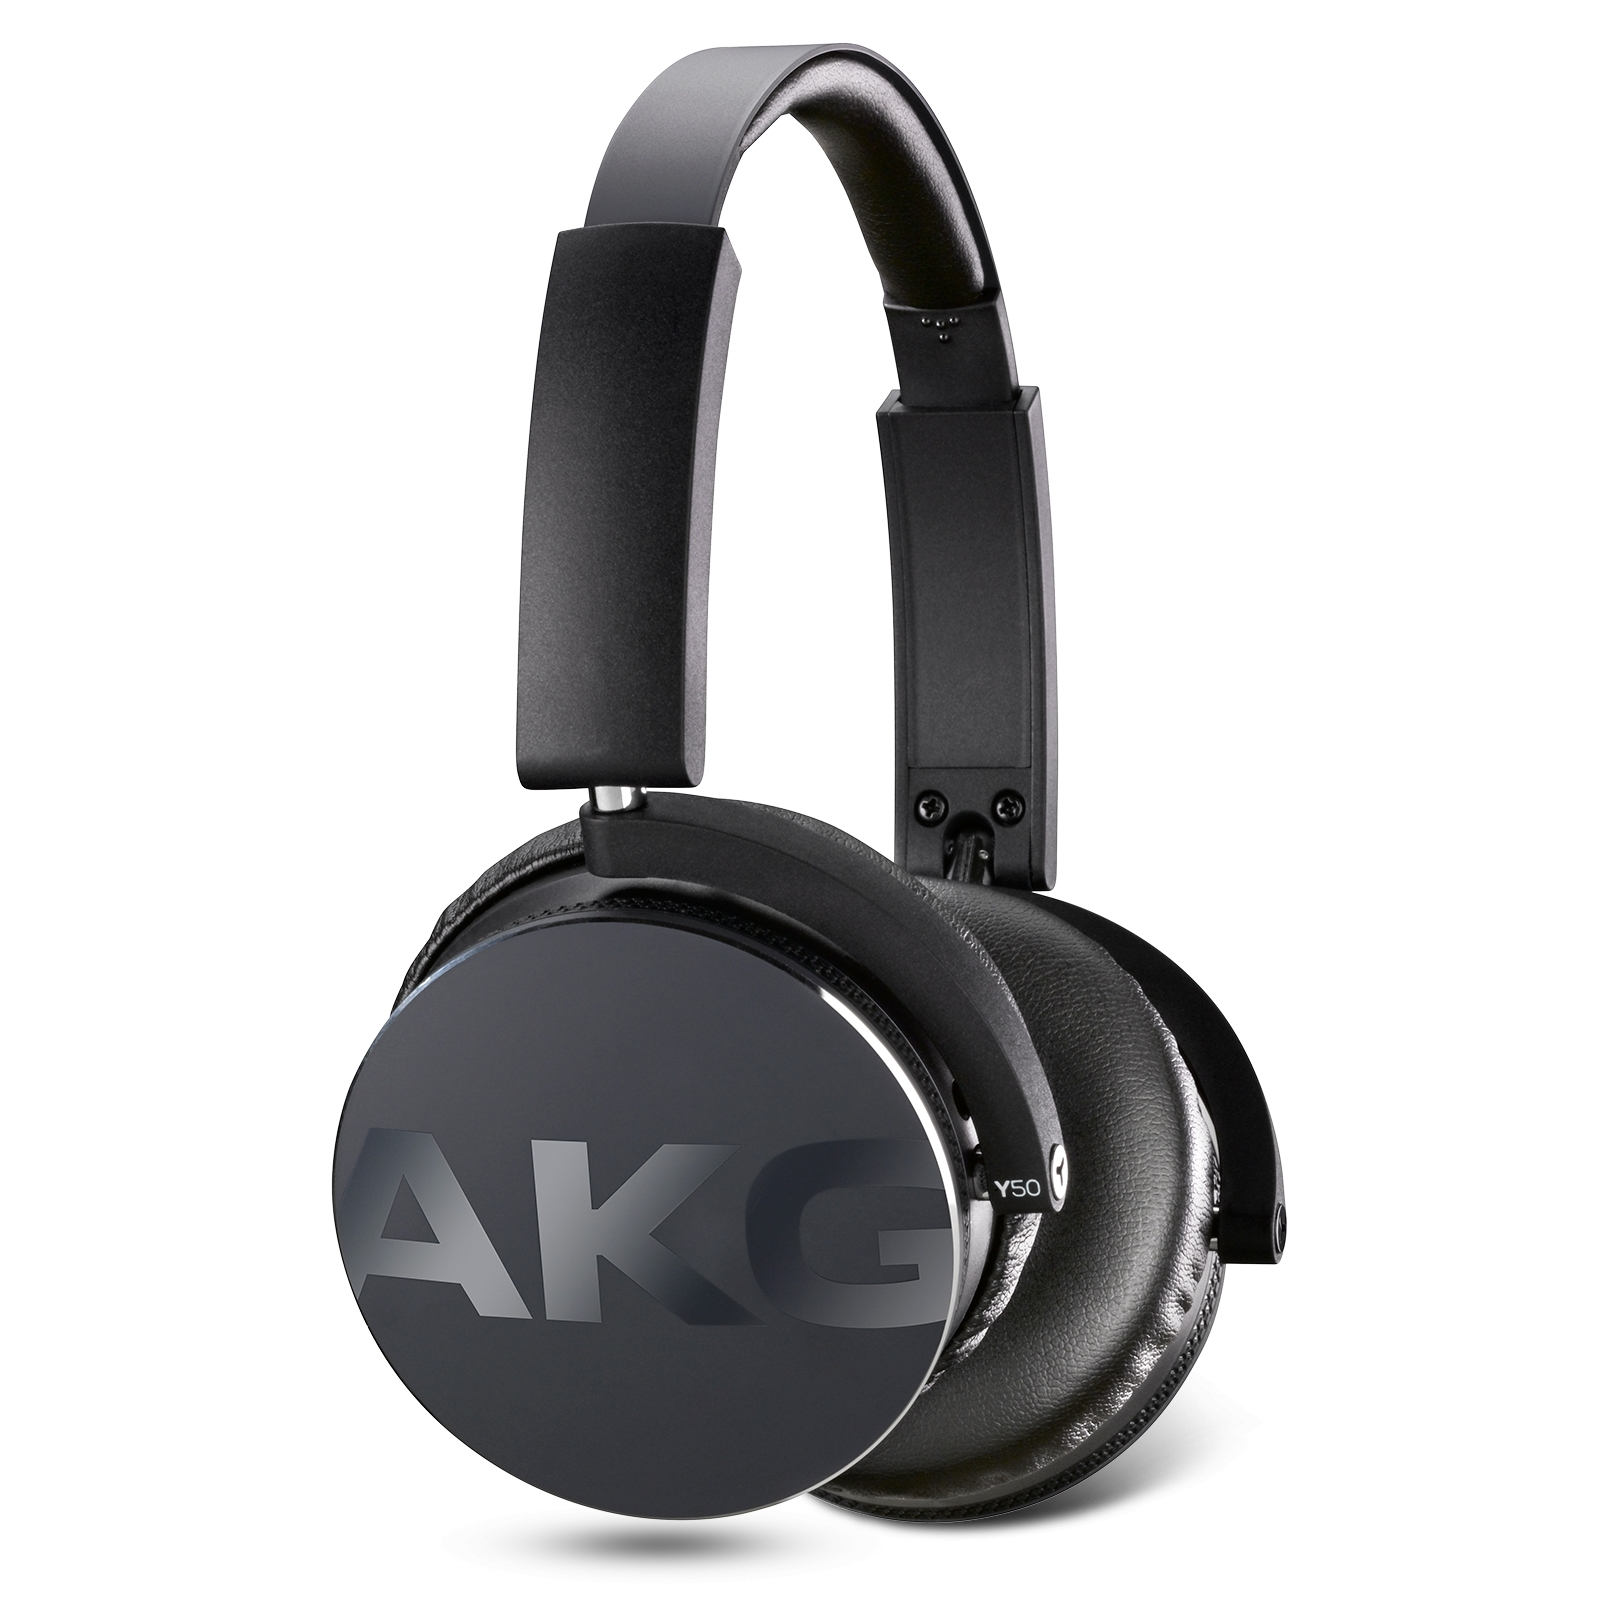 AKG-y50 svart - Ljudshopen 6b41ccfdf4dec